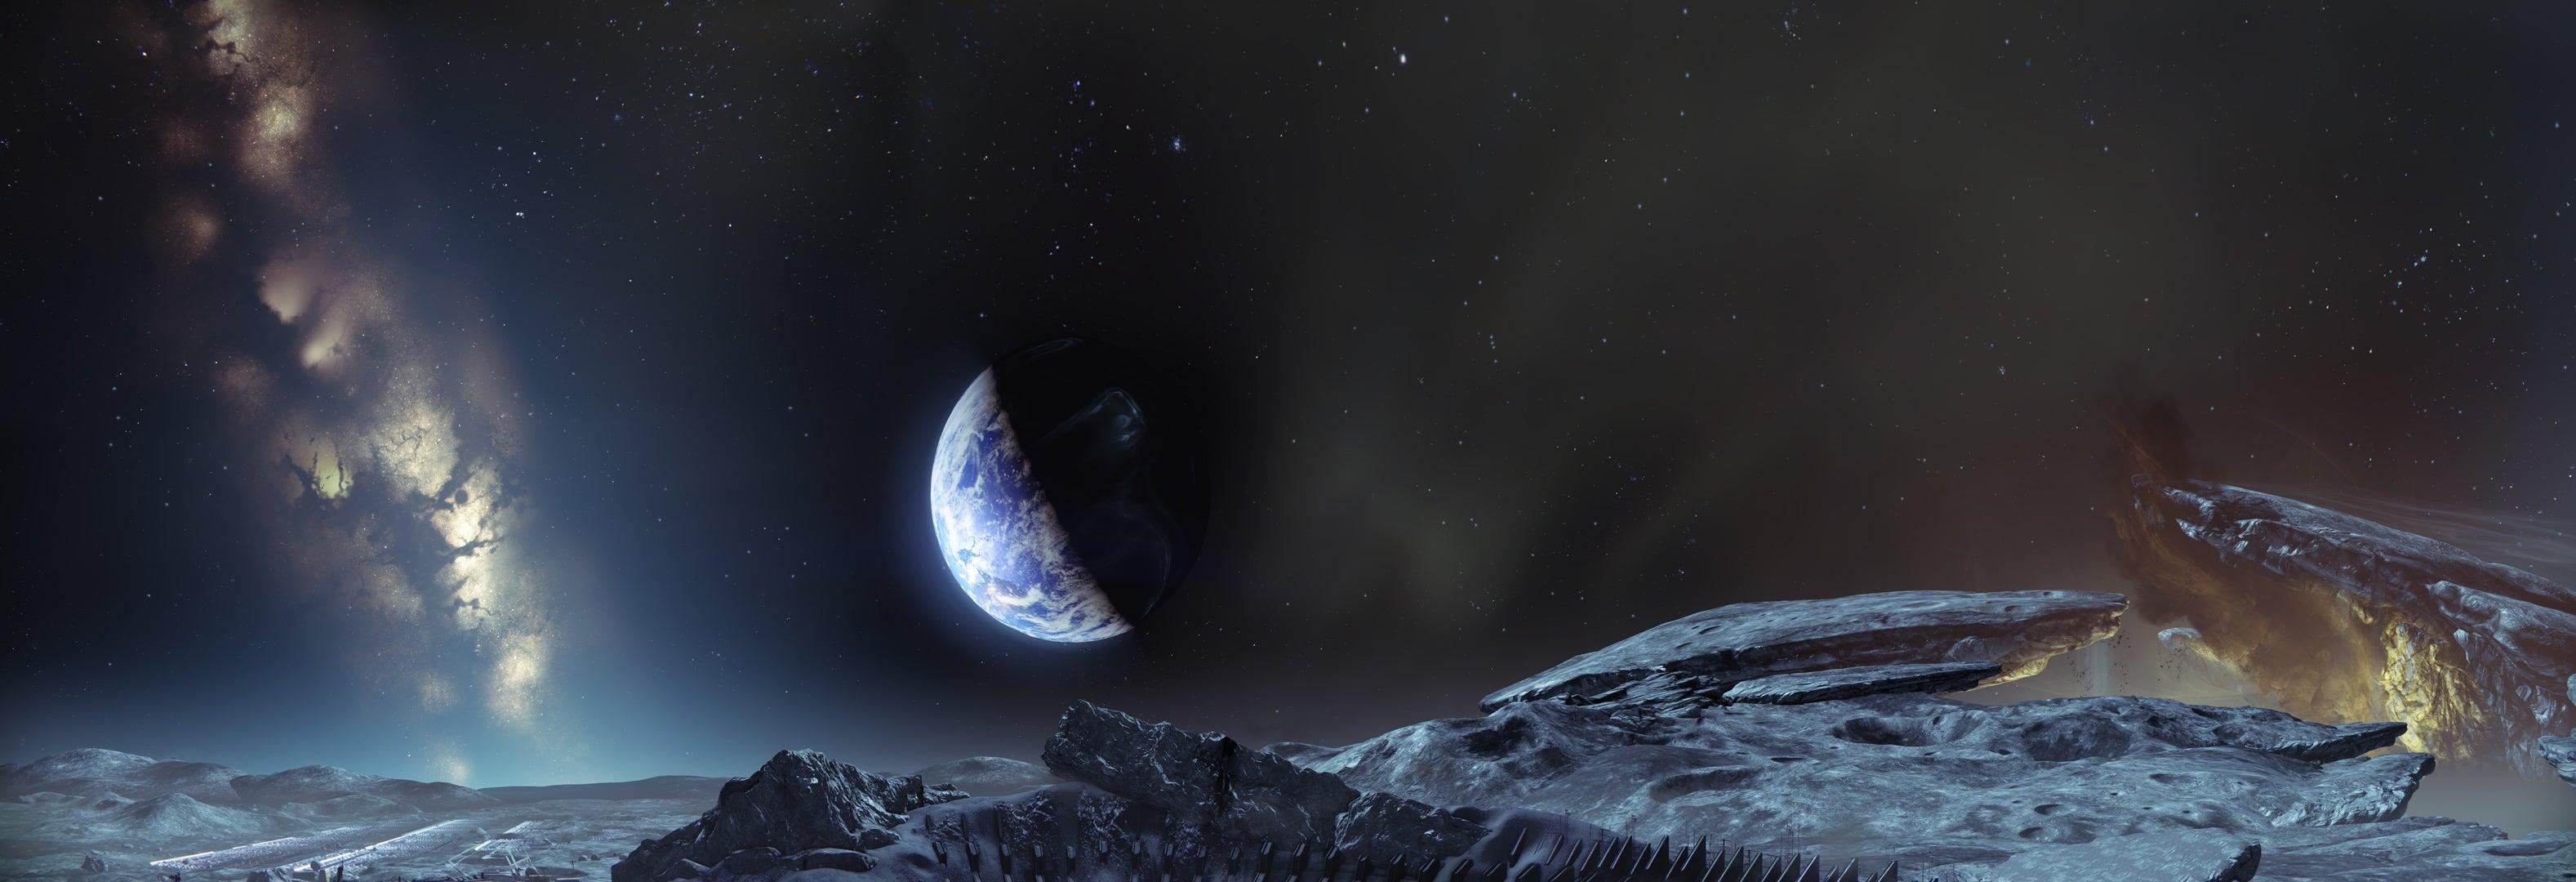 Planetary Romance  TV Tropes